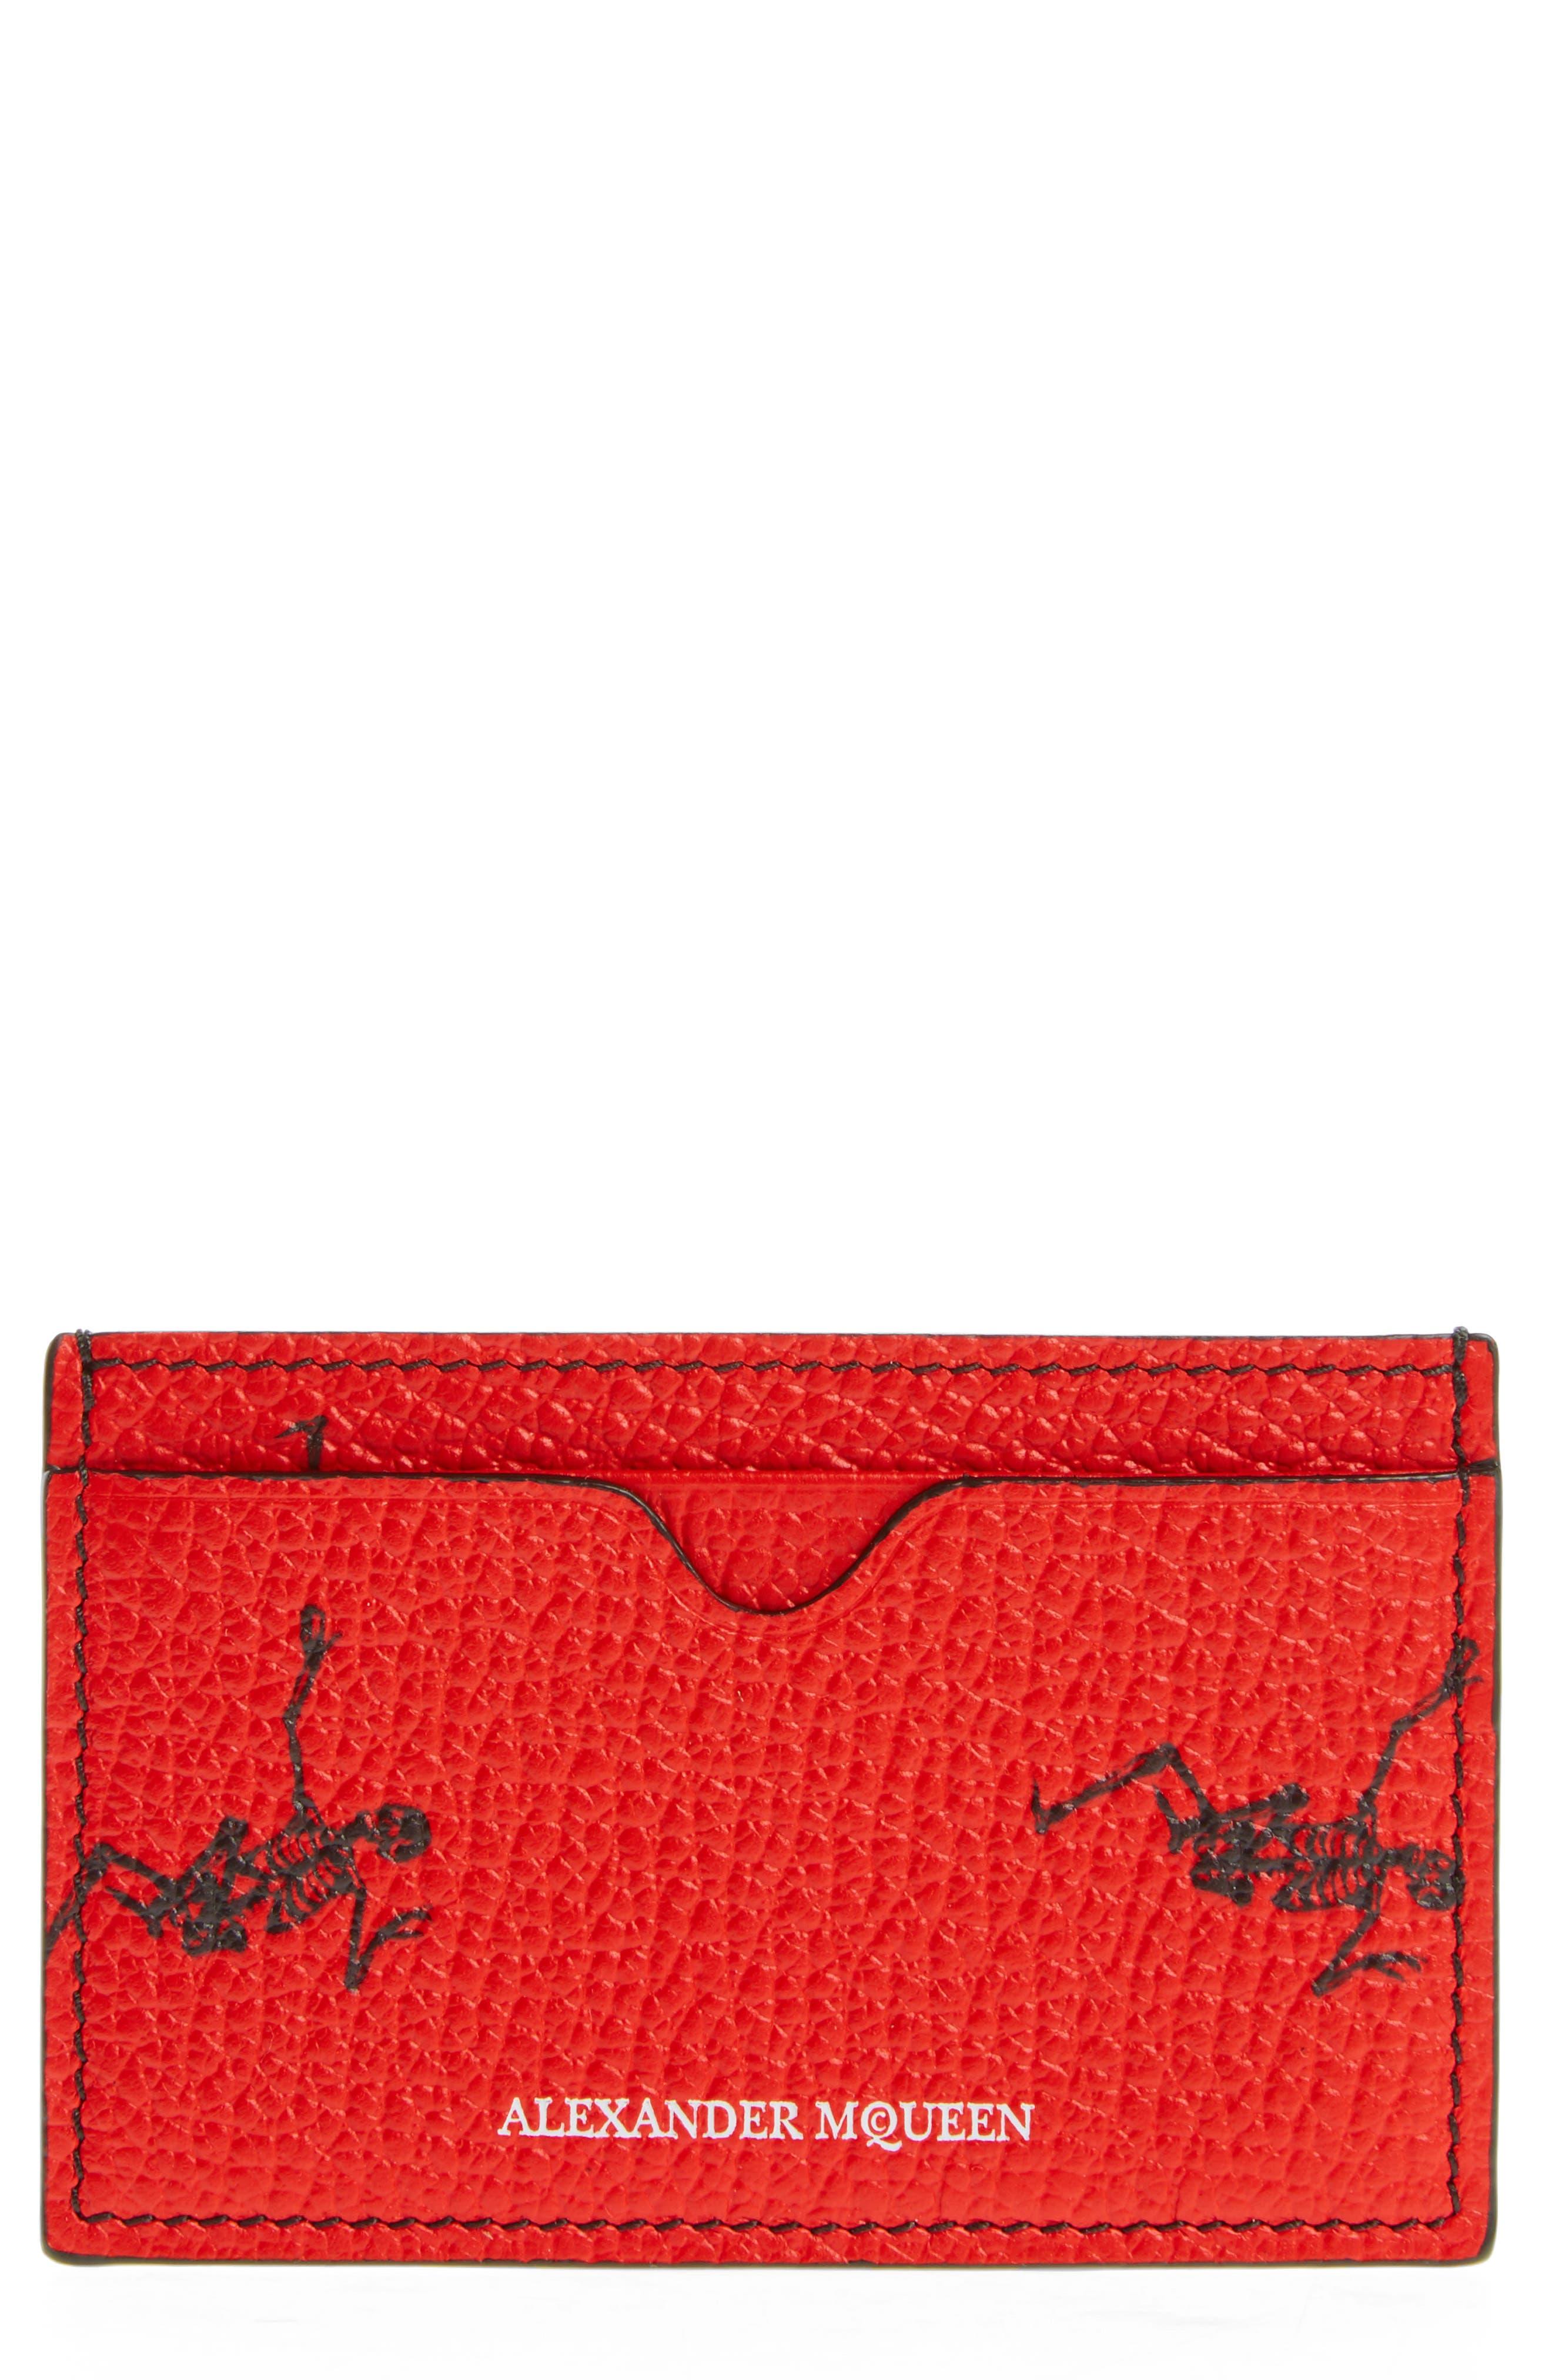 Dancing Skeleton Card Case,                             Main thumbnail 1, color,                             Scarlet Red/ Black